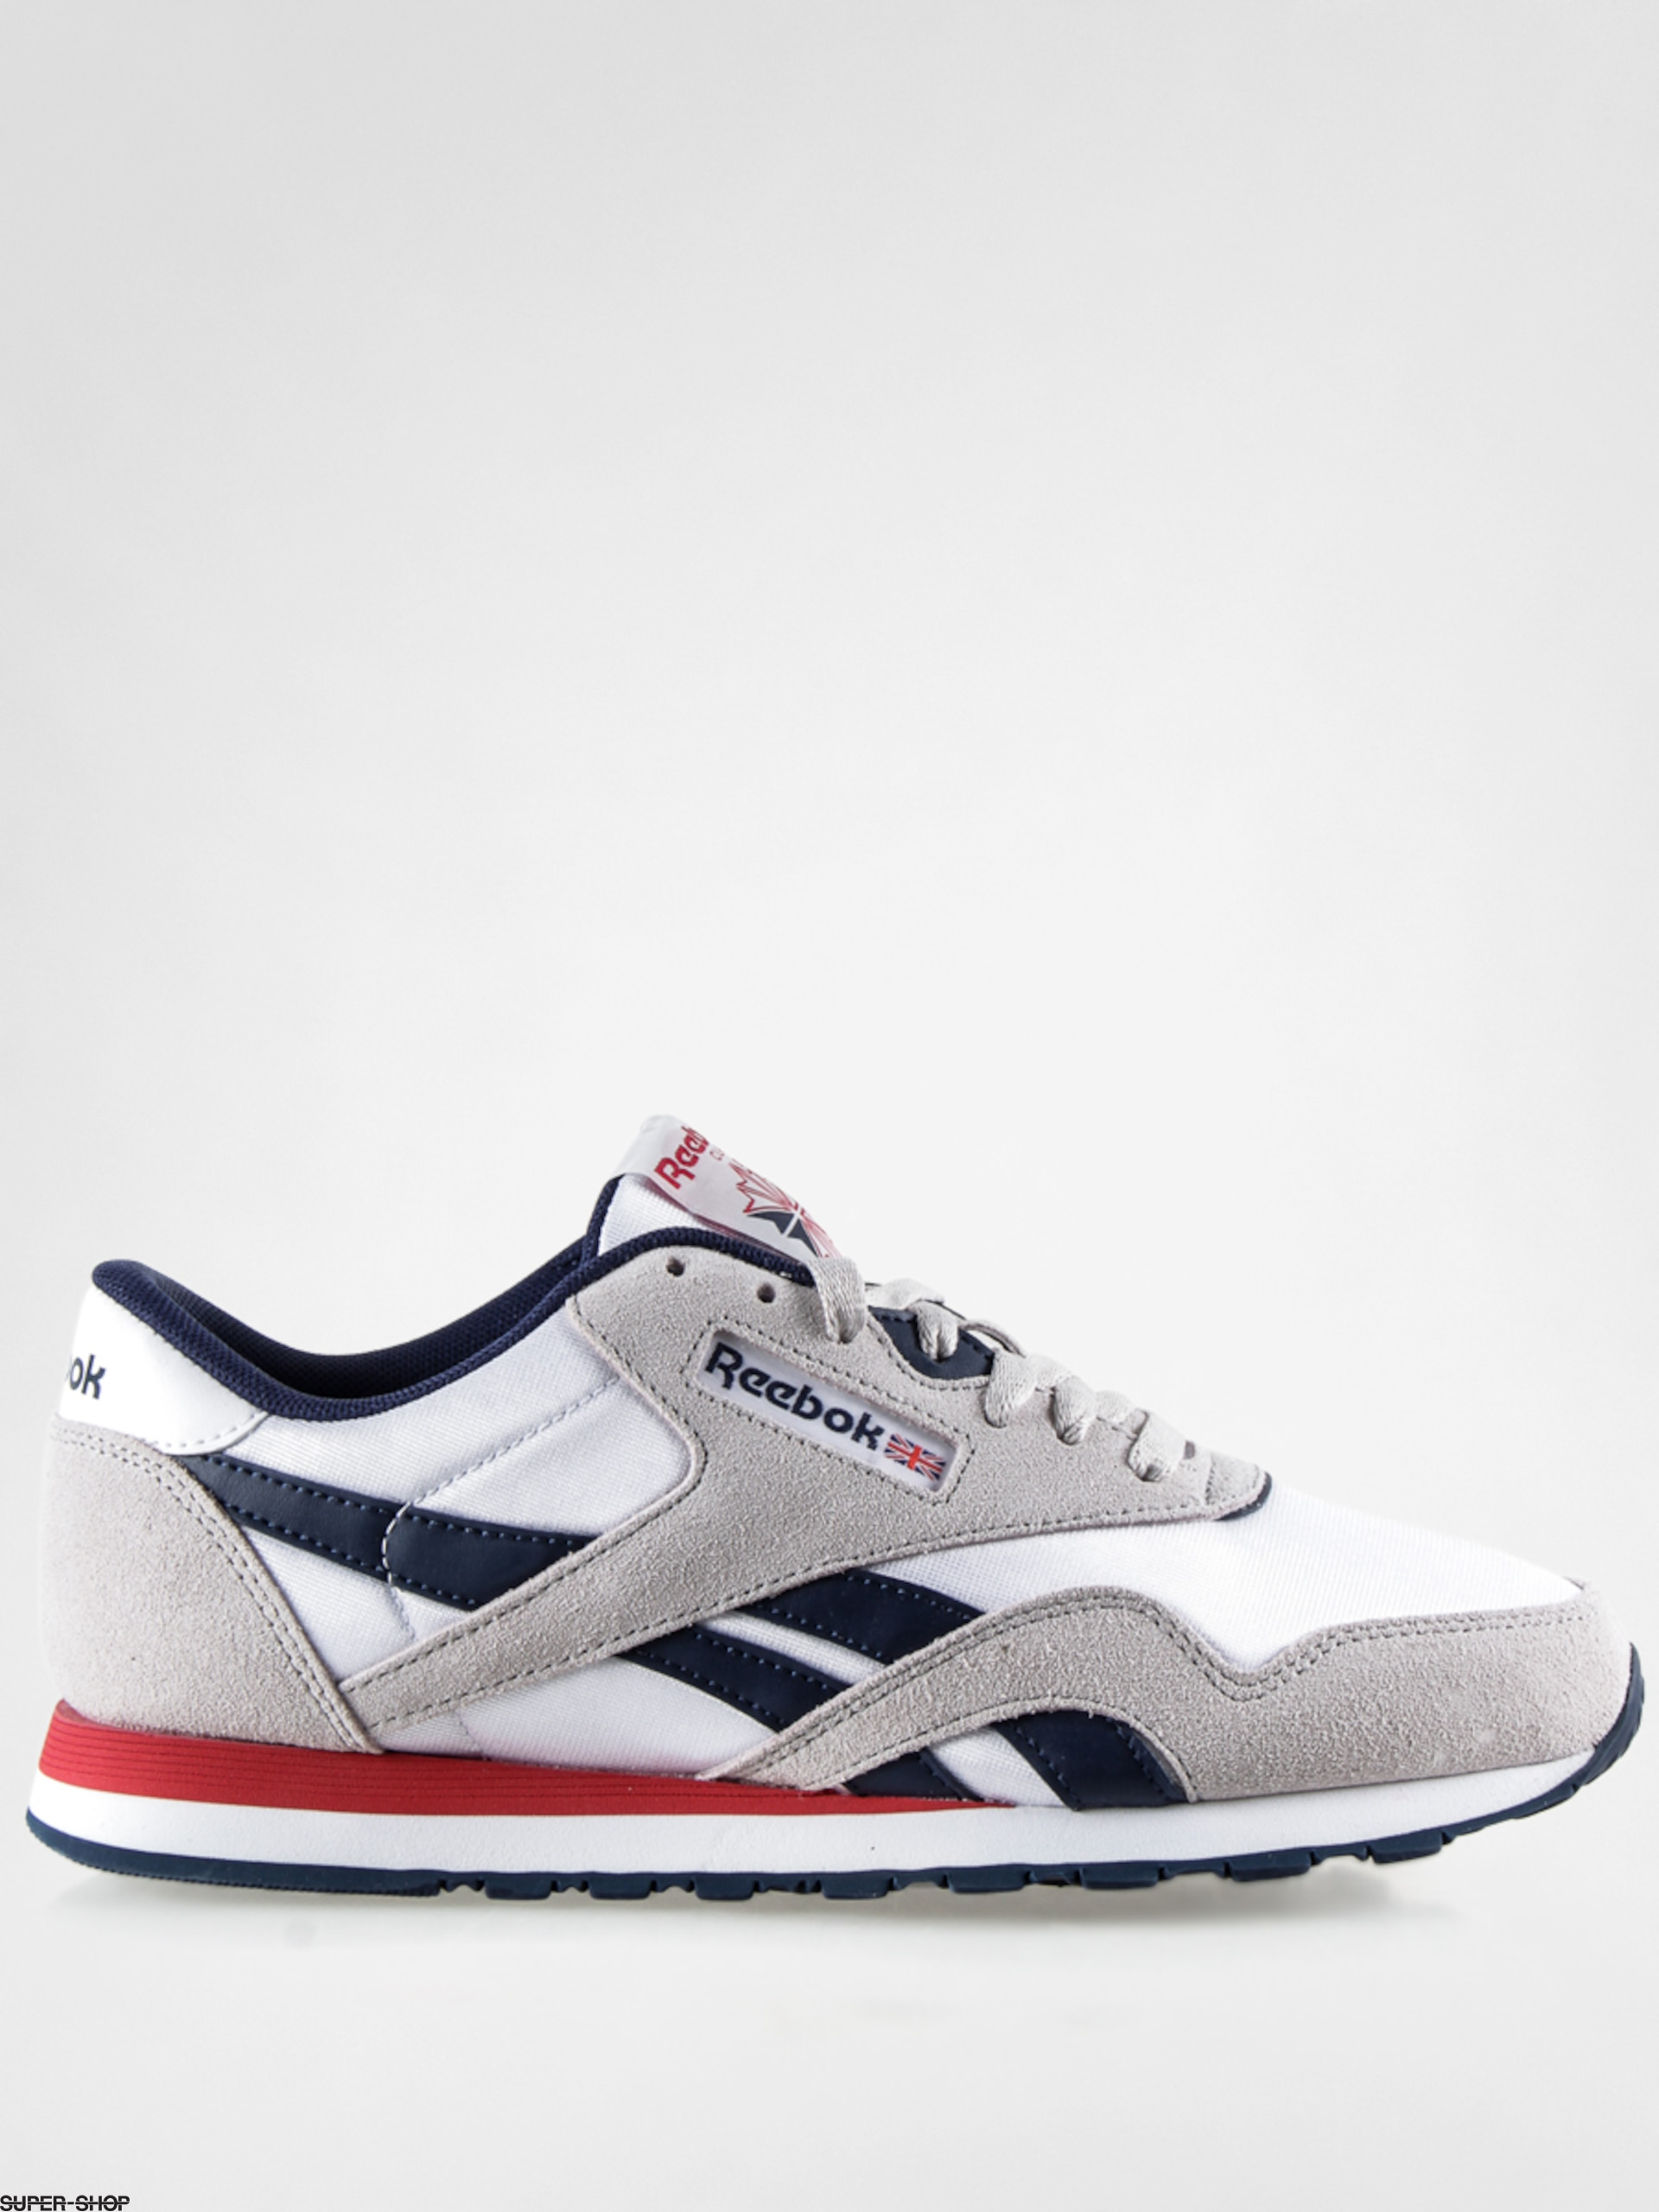 b1905d85edd Reebok Shoes CL Nylon SP (white steel navy red)